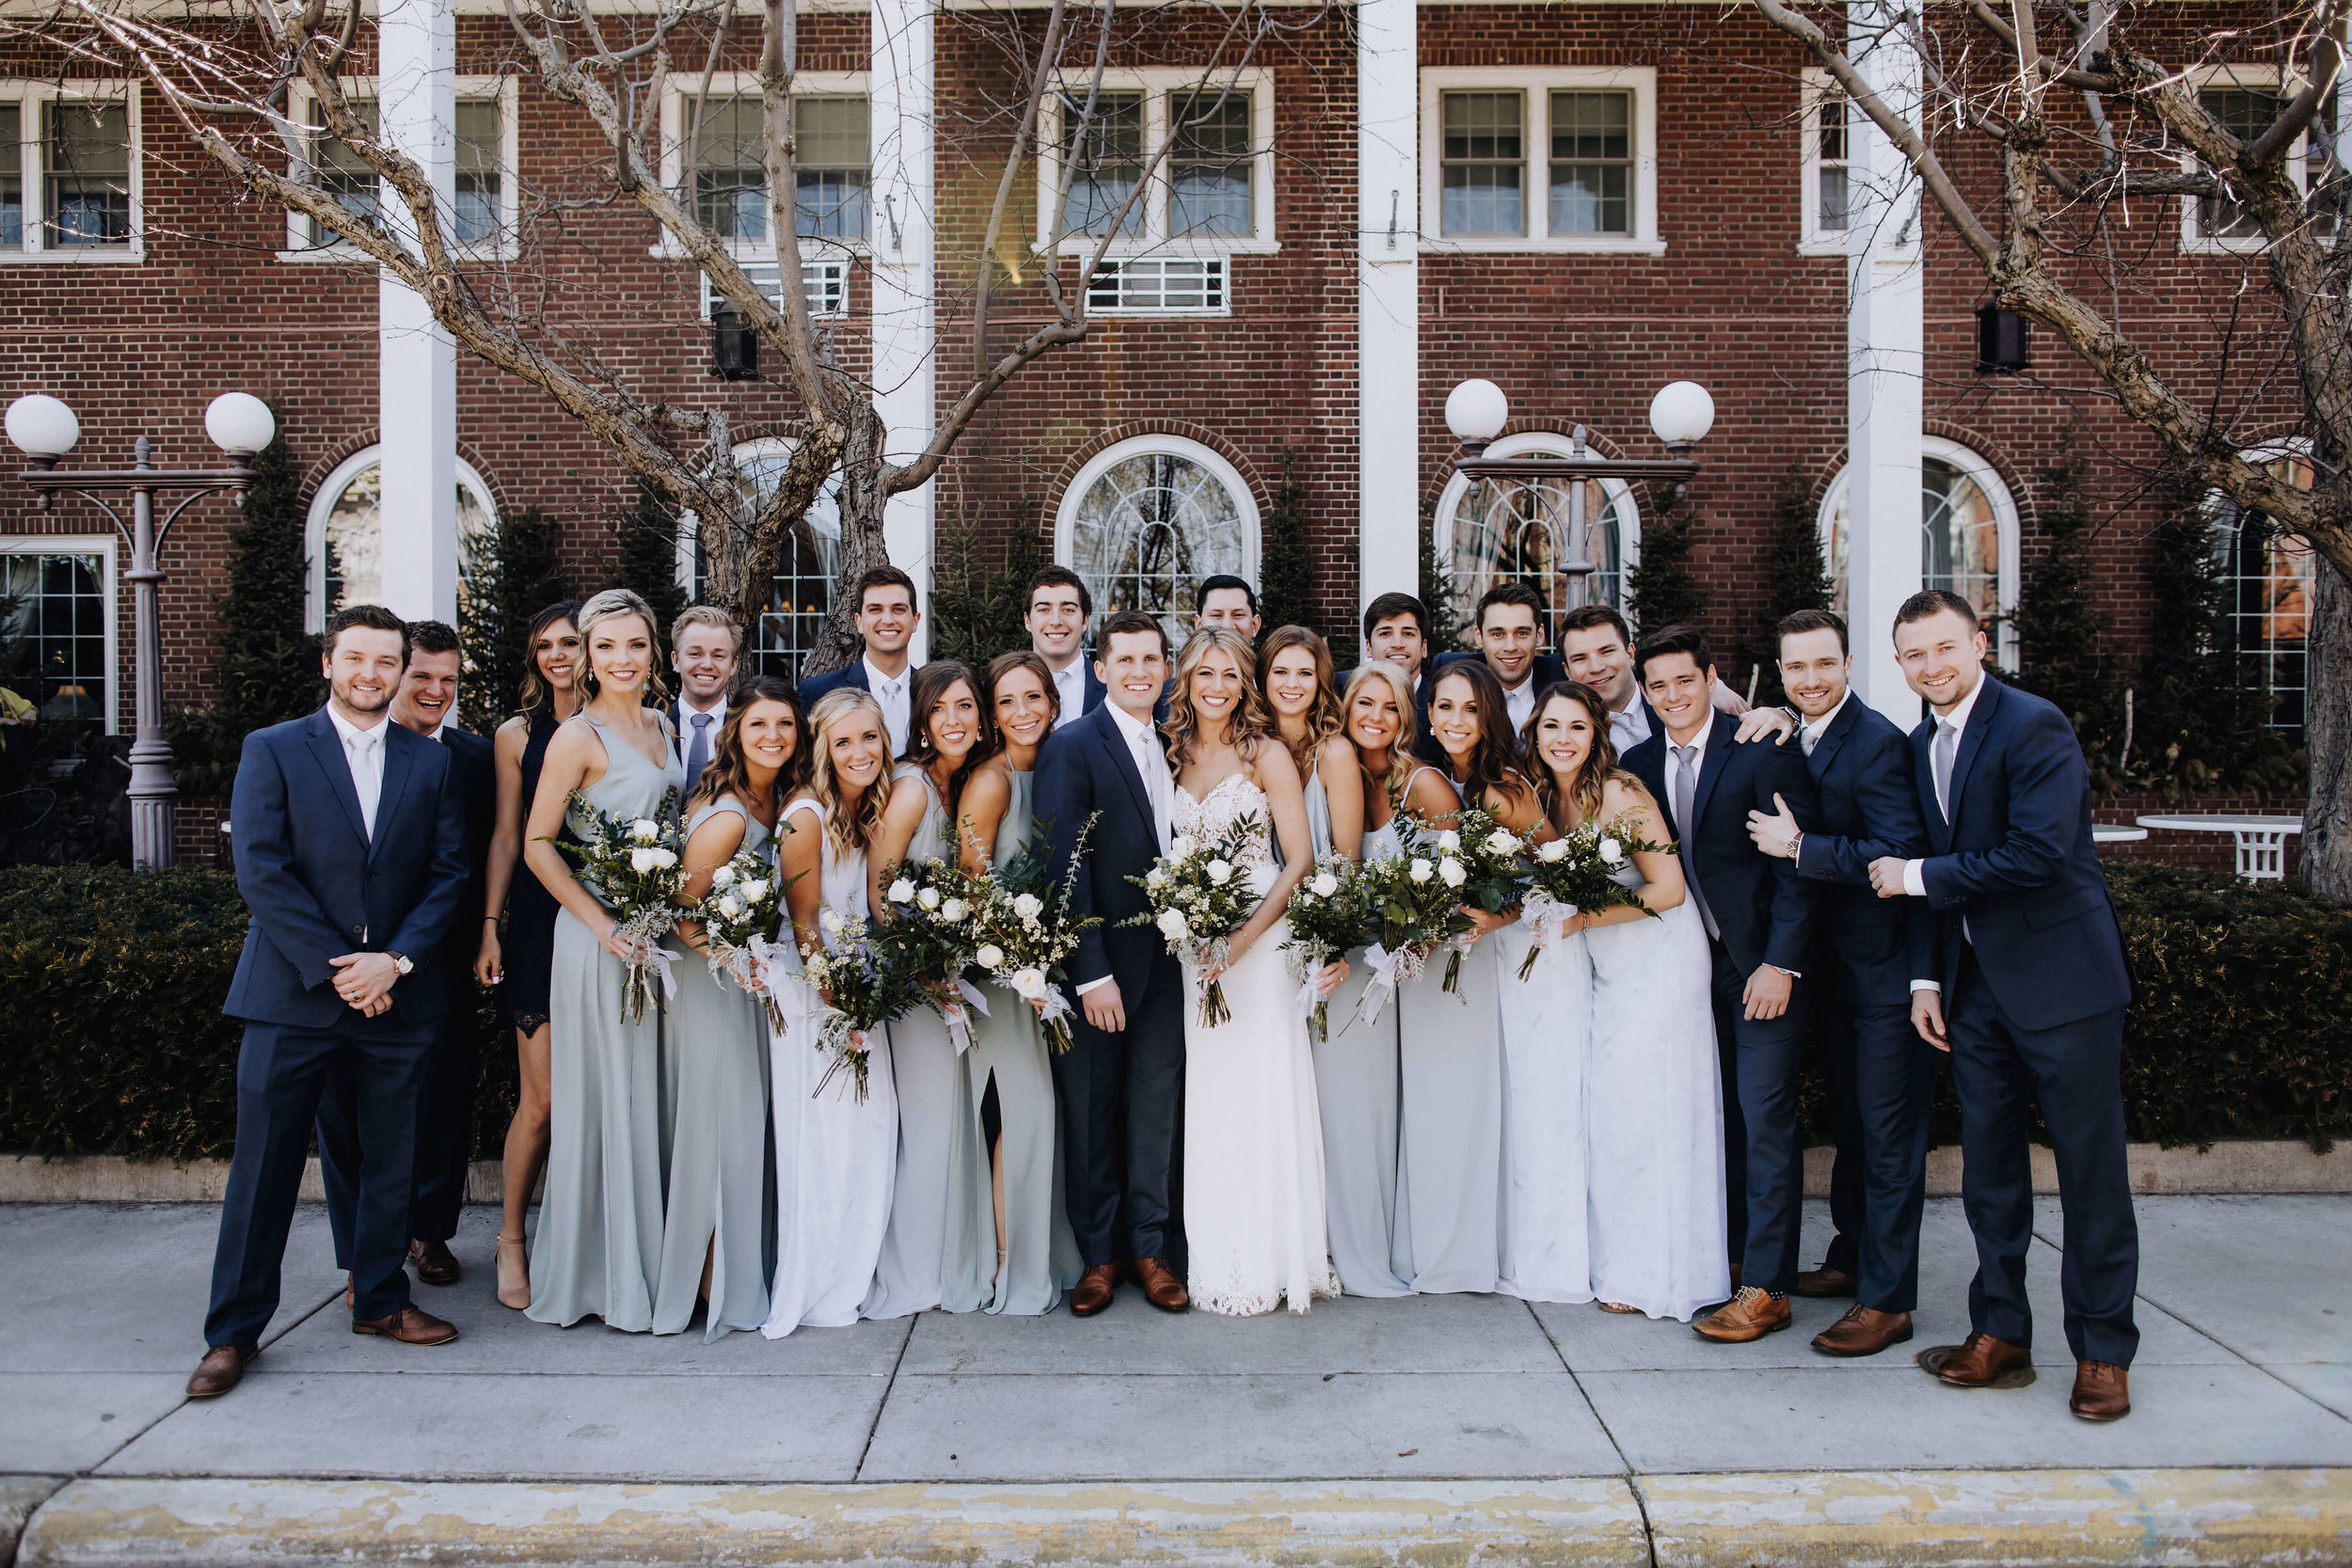 engle-olson-ashley-schyler-wedding-matt-lien-photography-1.jpg